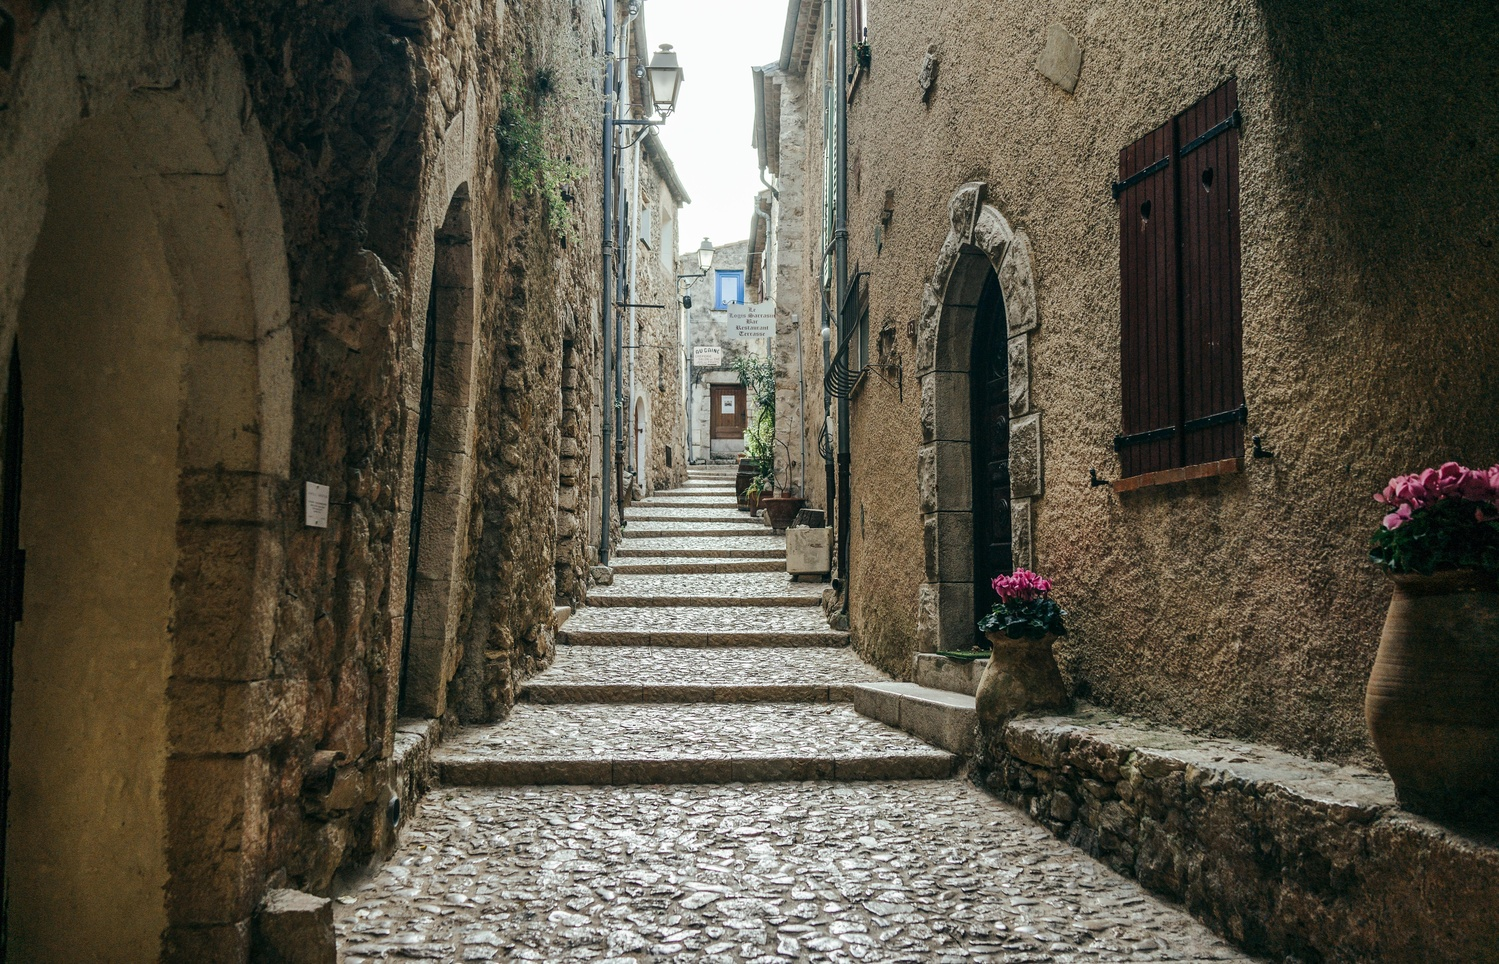 Saint-Agnes by TYLER YATES